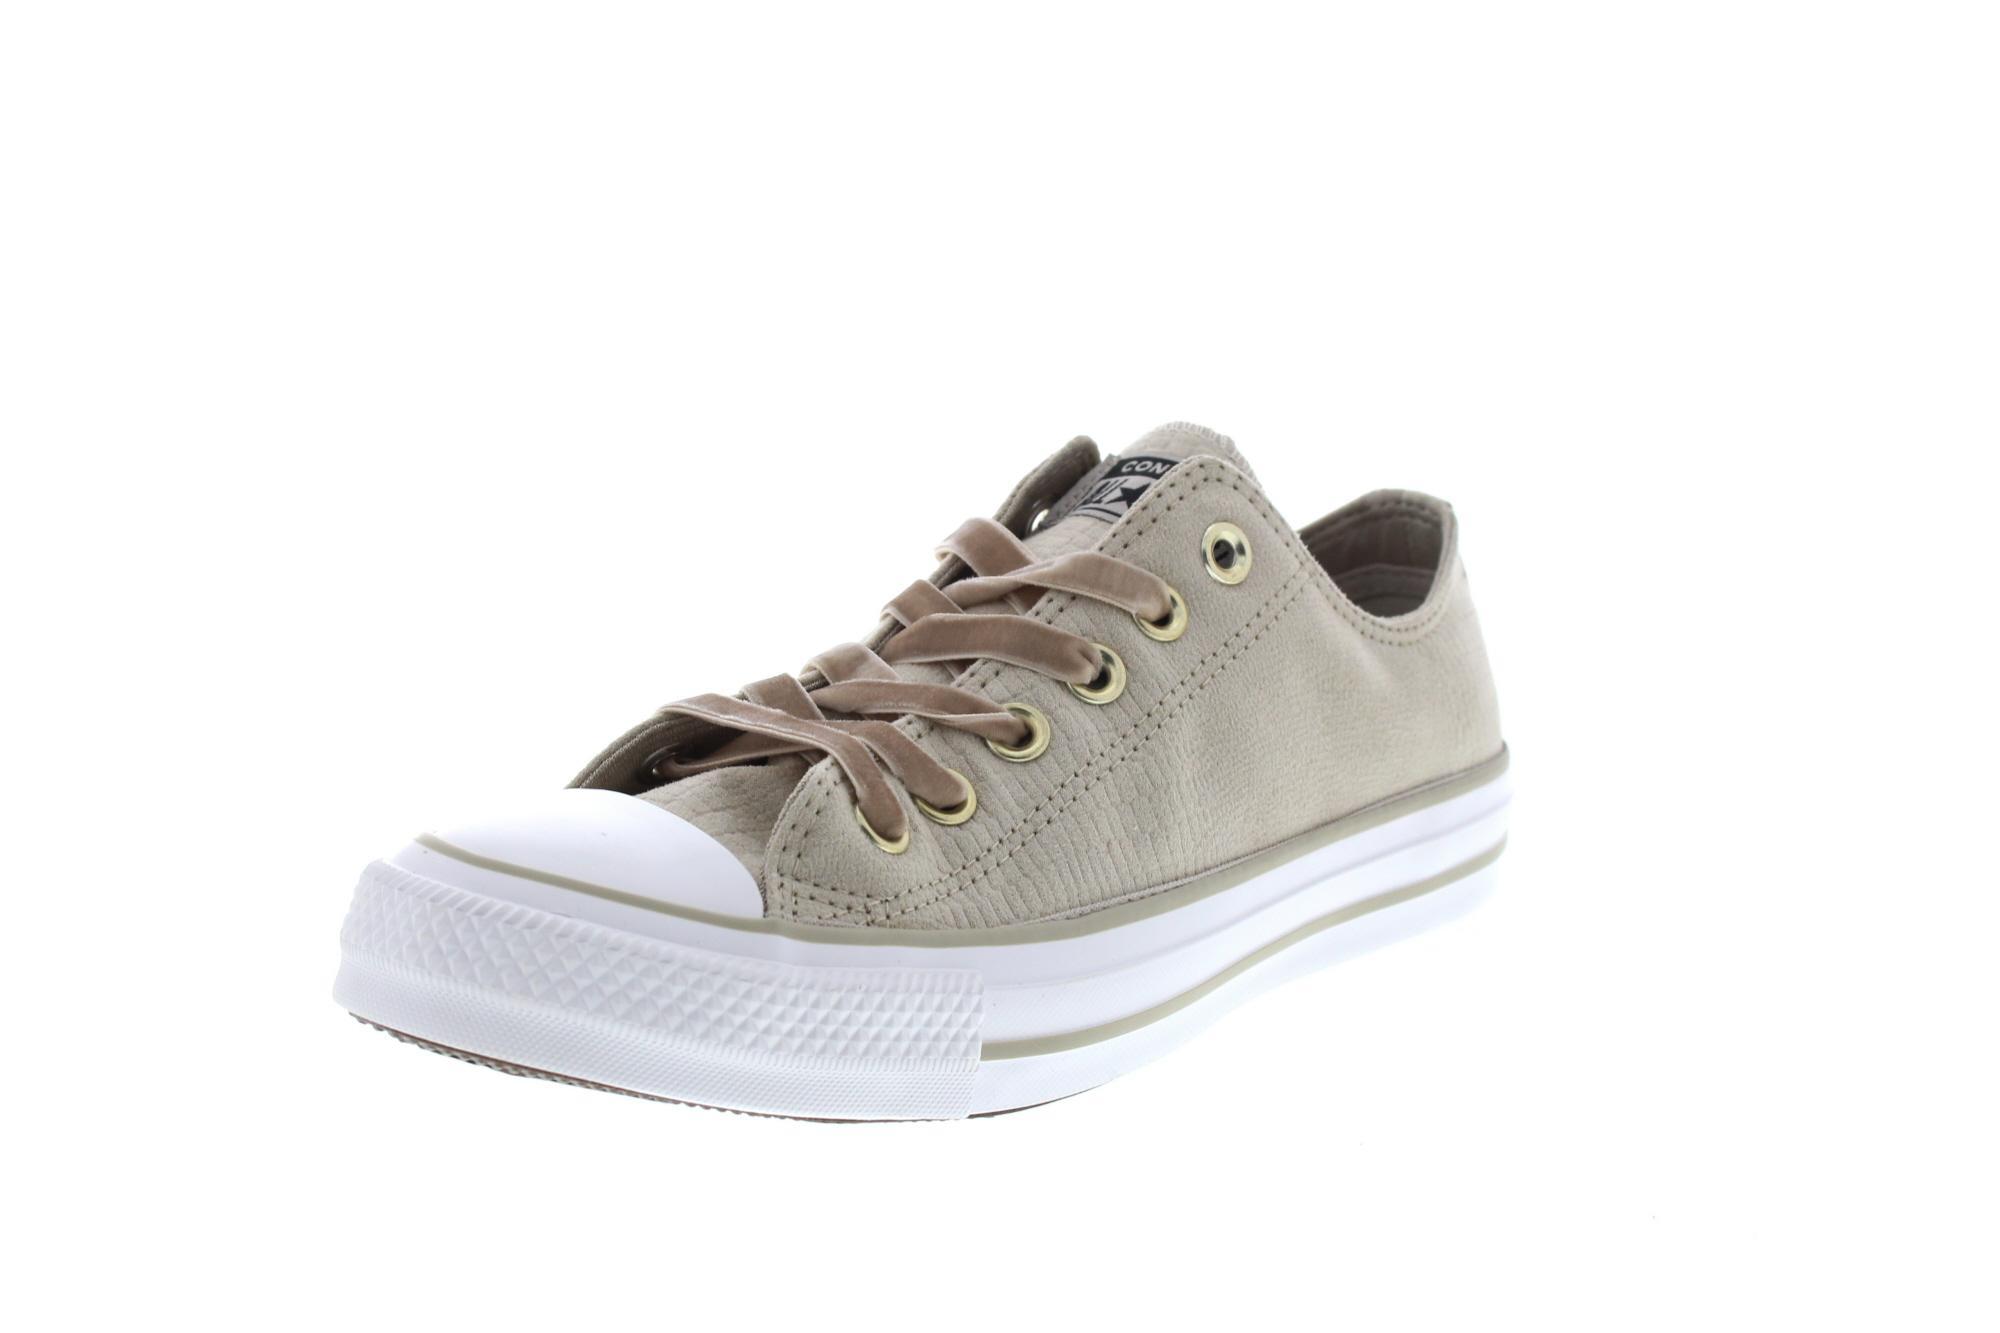 CONVERSE Damen Sneakers - CTAS OX 561704C - papyrus0-6619